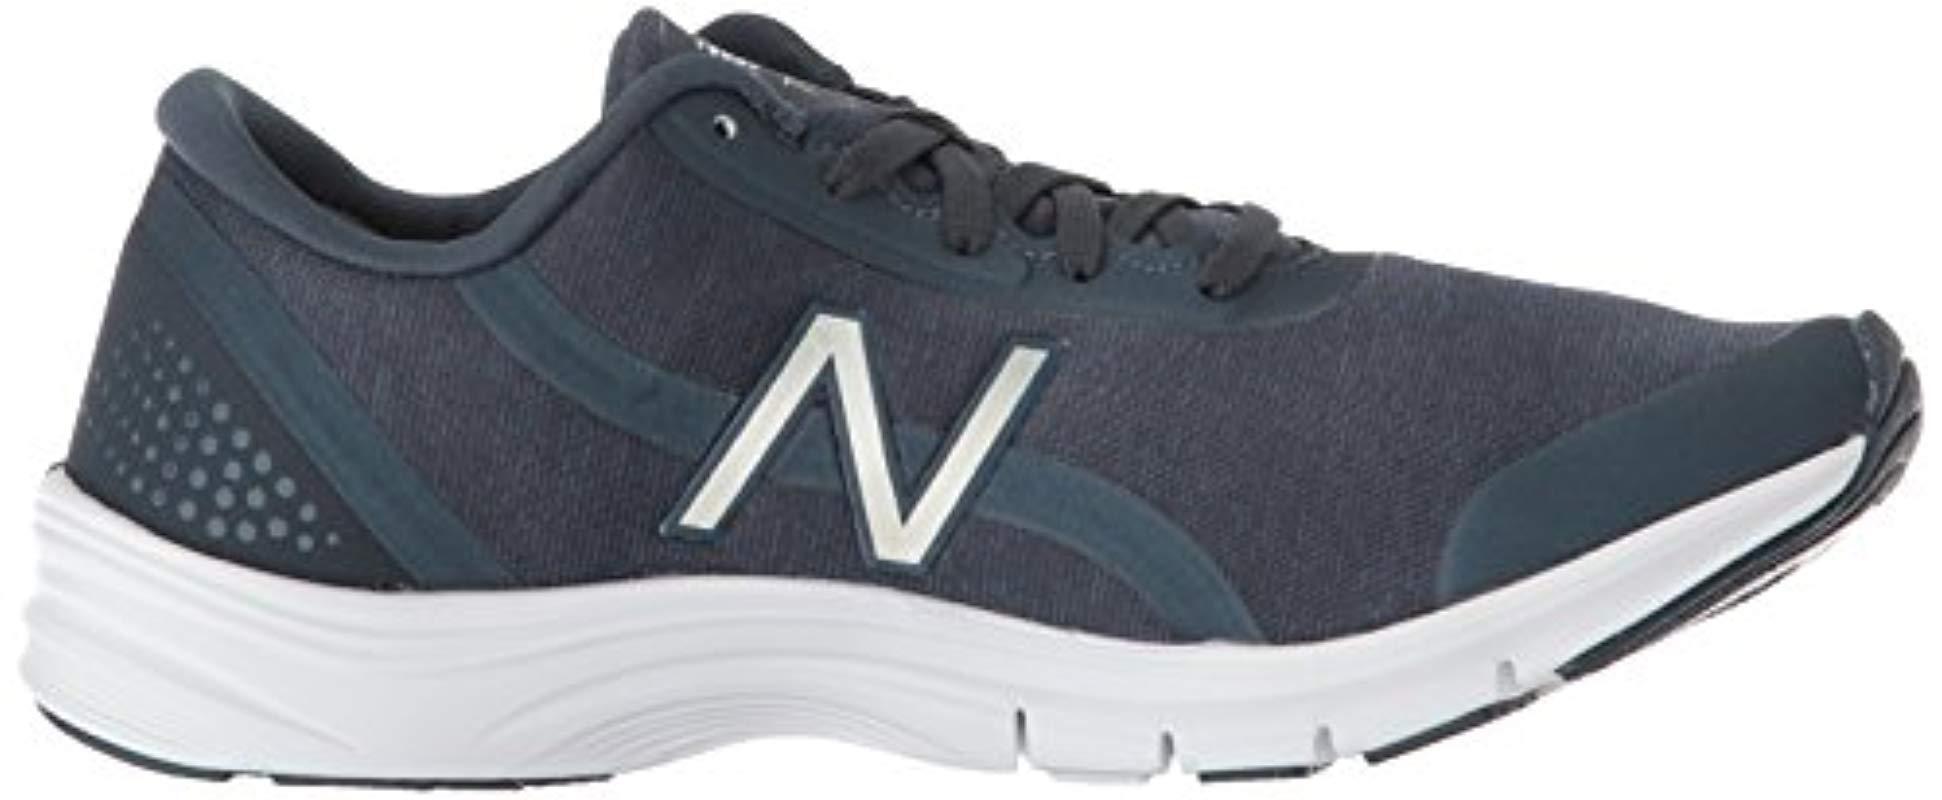 New Balance 711 V3 Cross Trainer in